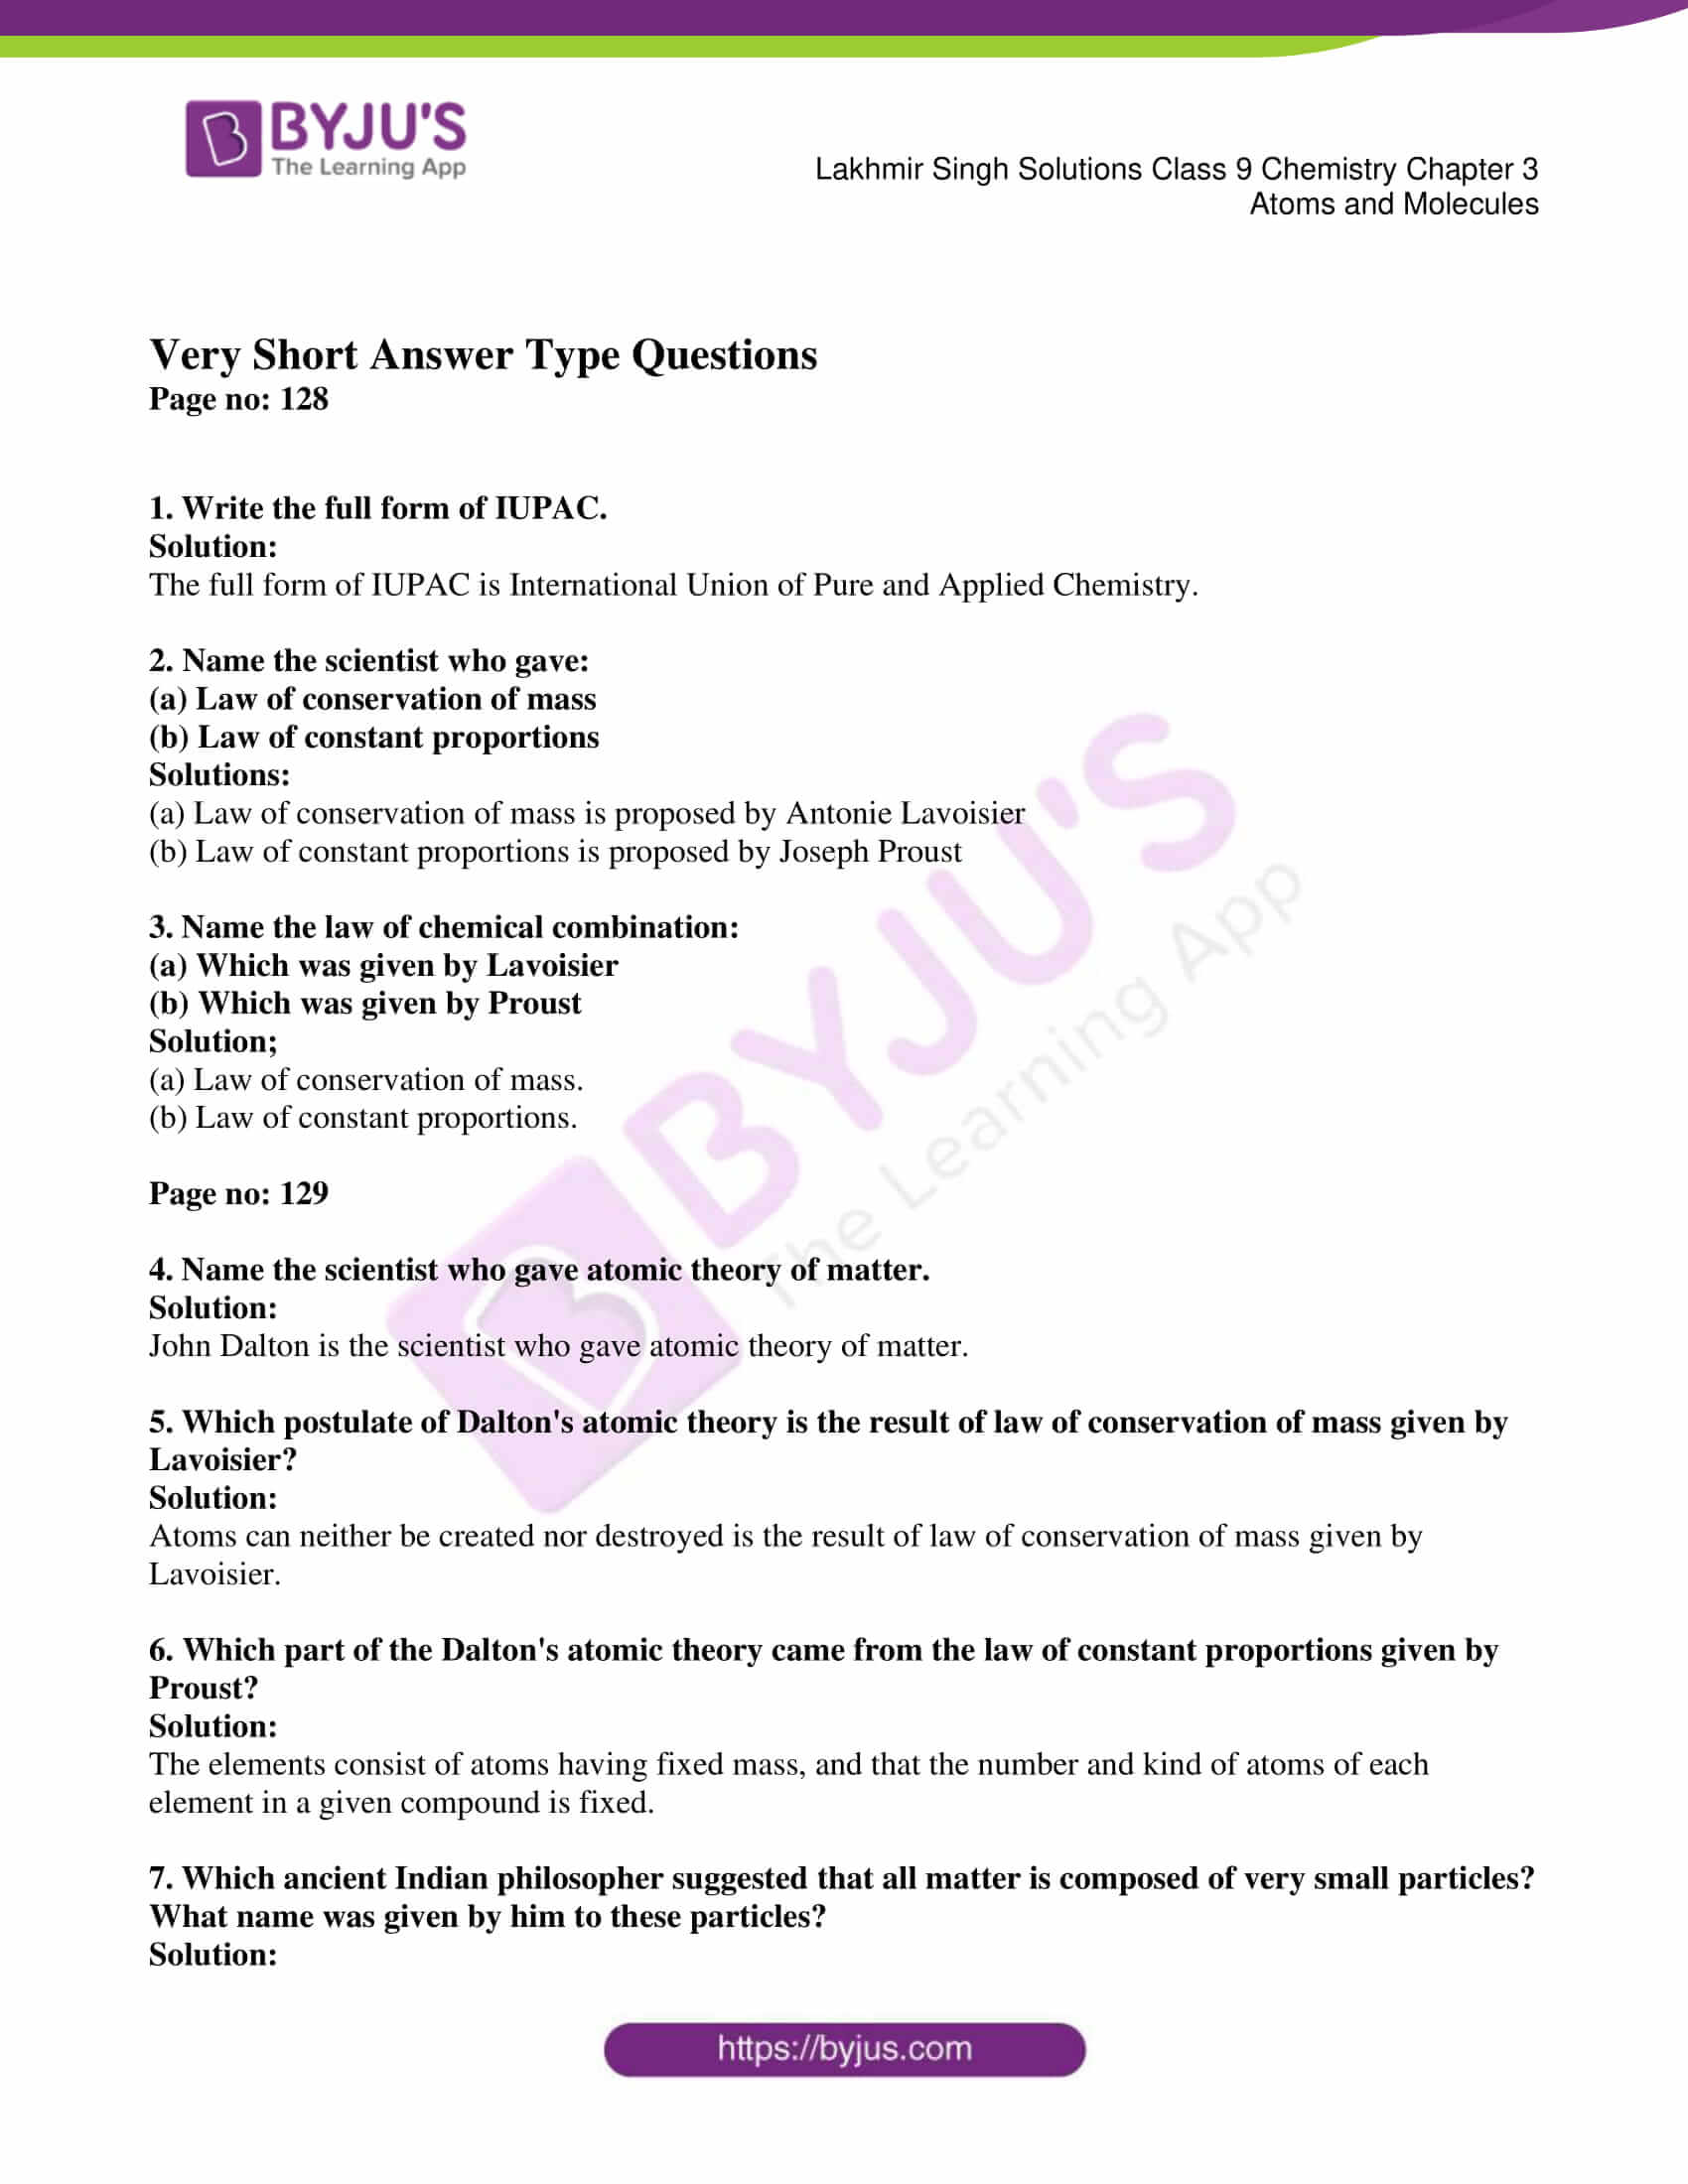 lakhmir singh solutions class 9 chemistry chapter 3 01